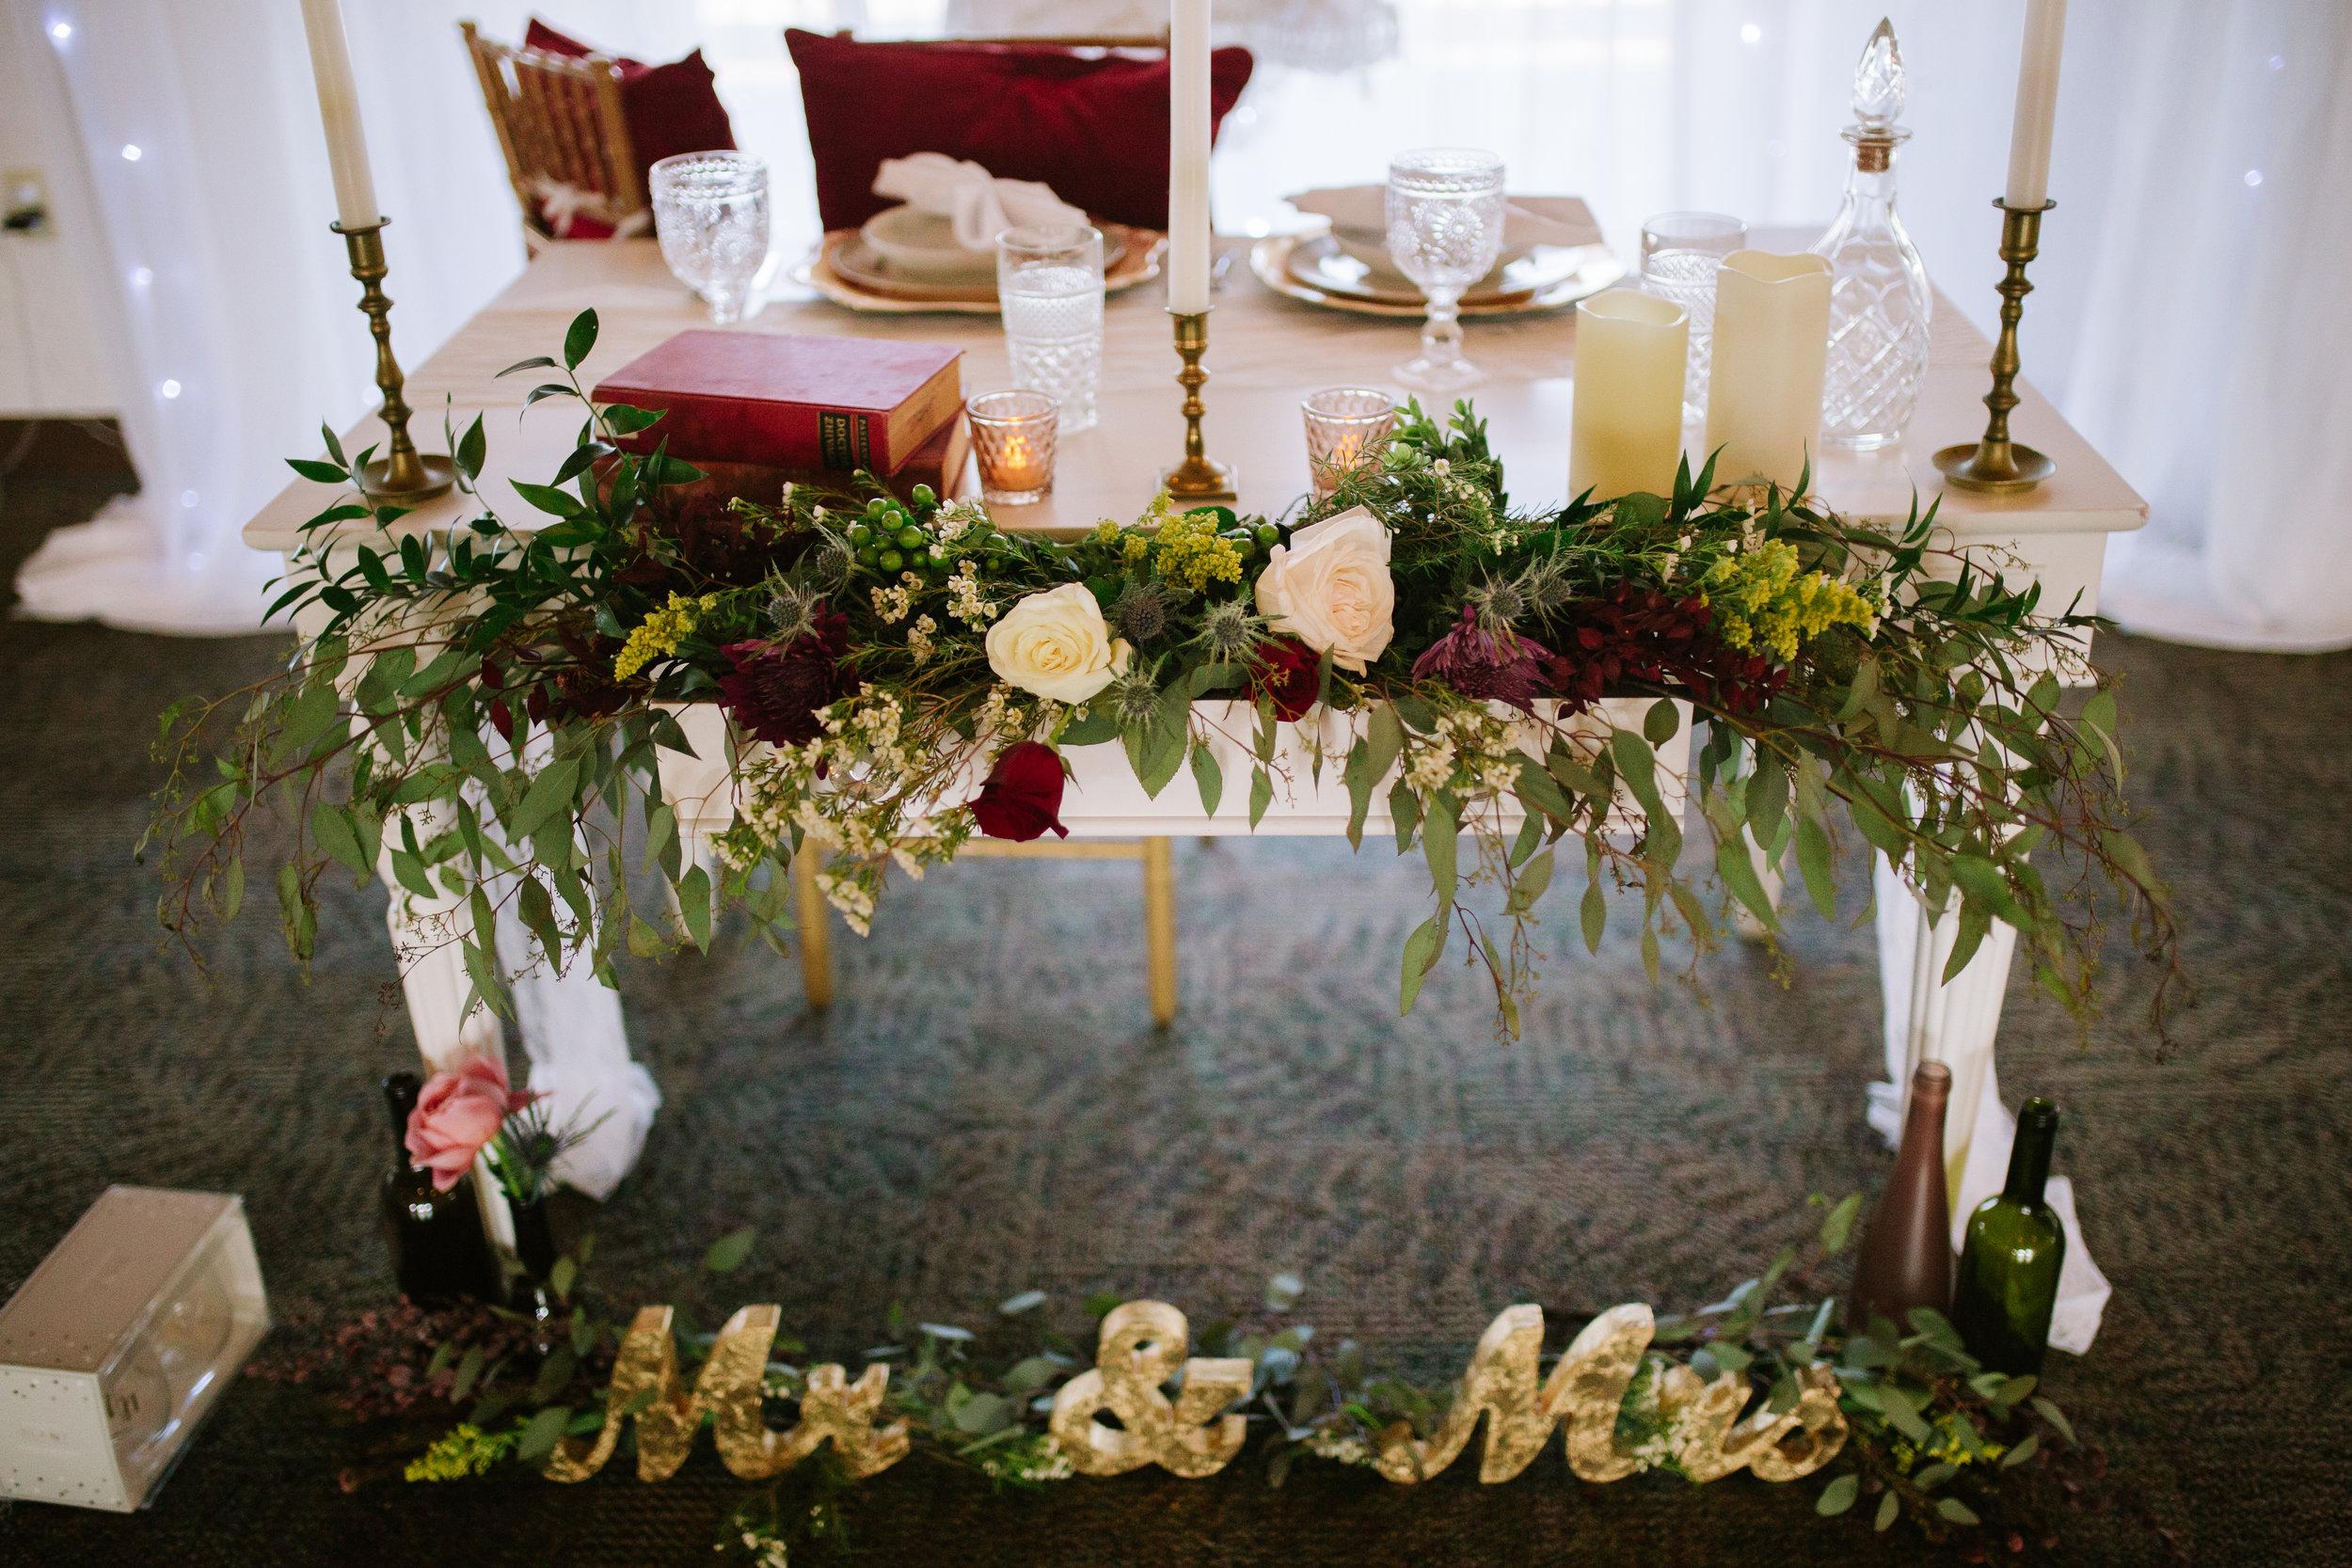 2017.05.23 Barbara and Mauricio Sales Port St Lucie Wedding (158 of 772).jpg